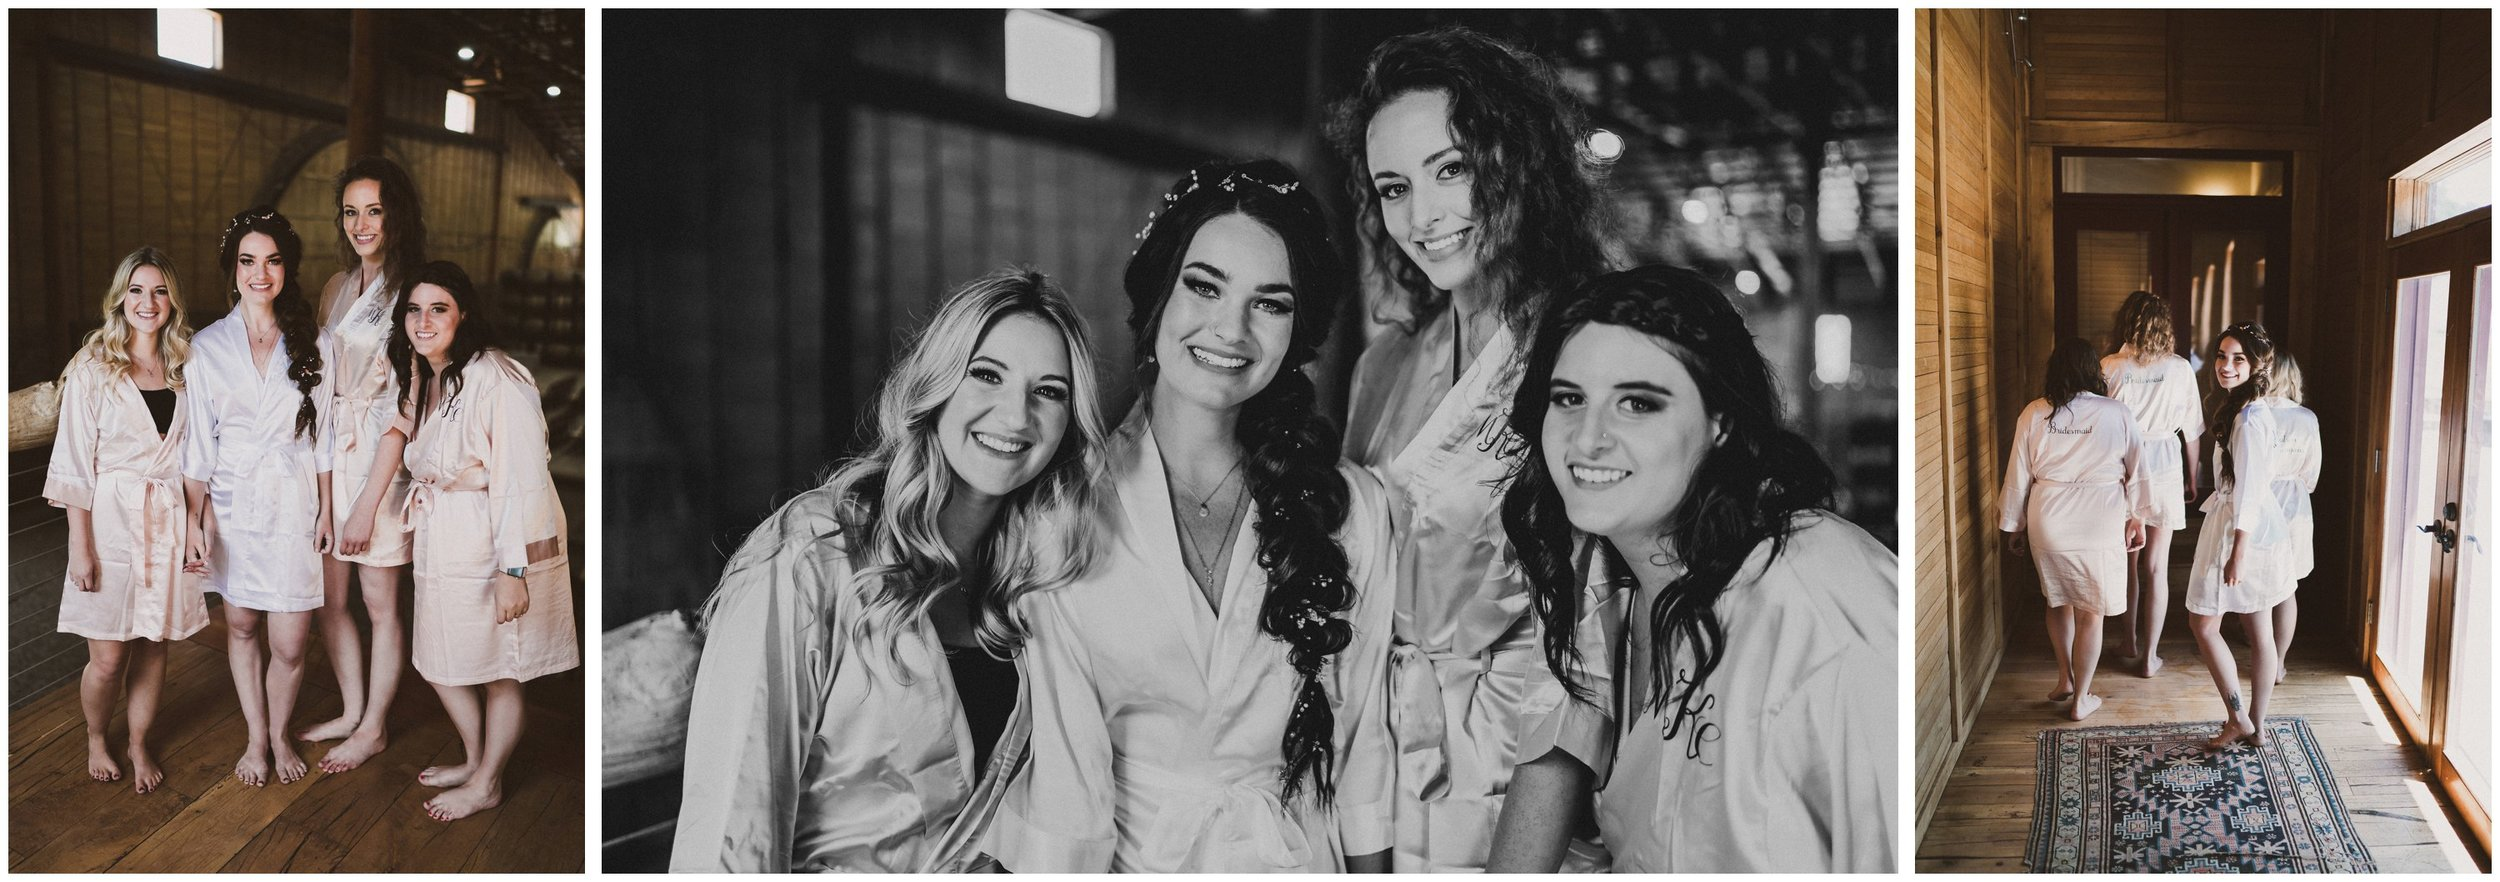 TONY-GAMBINO-PHOTOGRAPHY-BEND-OREGON-WEDDING-SHOOT-000_1504 bridal party.jpg